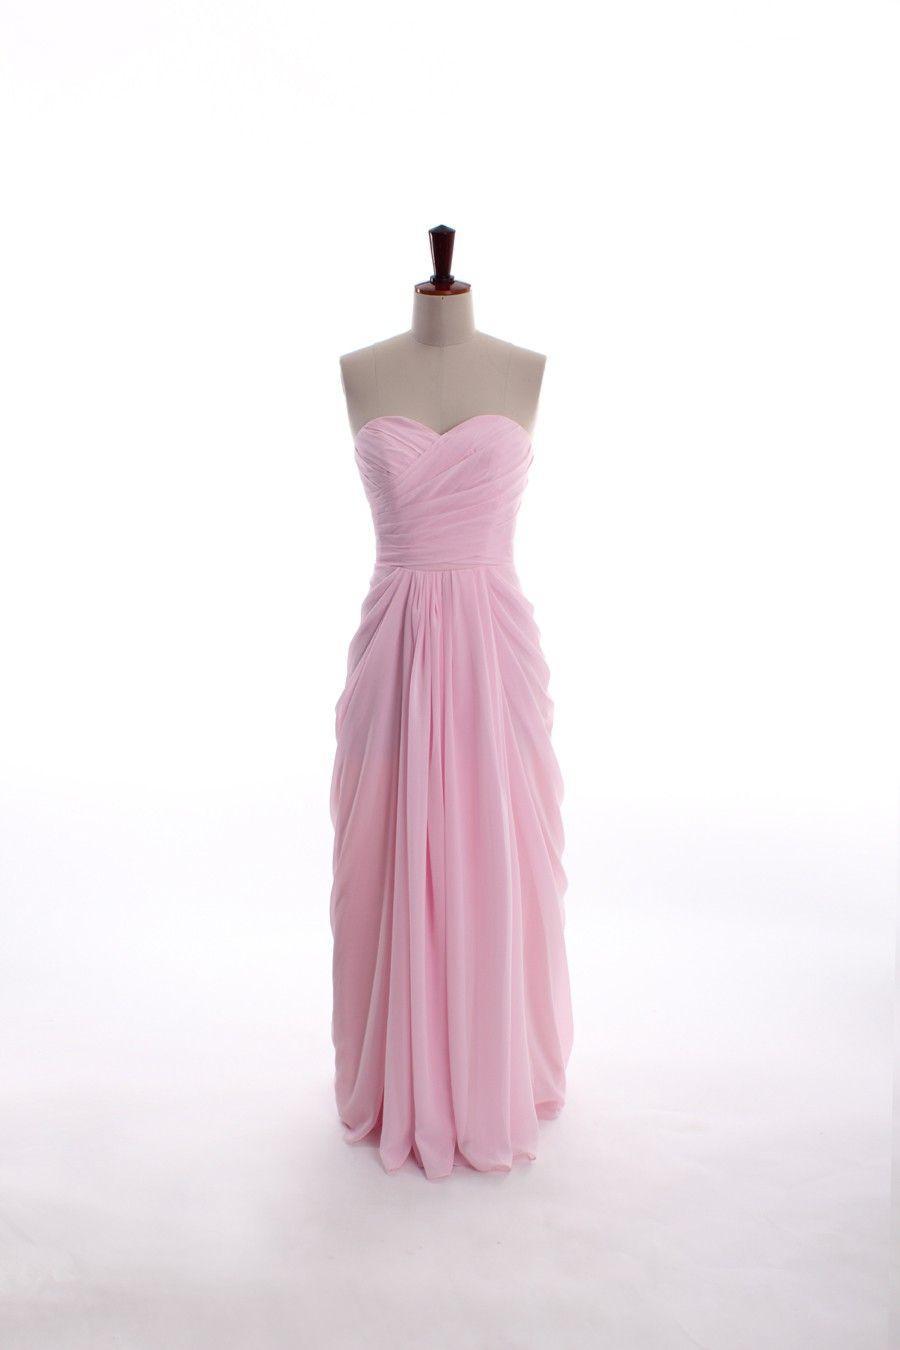 sweetheart neckline chiffon dress | Bridesmaids & Bachelorette party ...